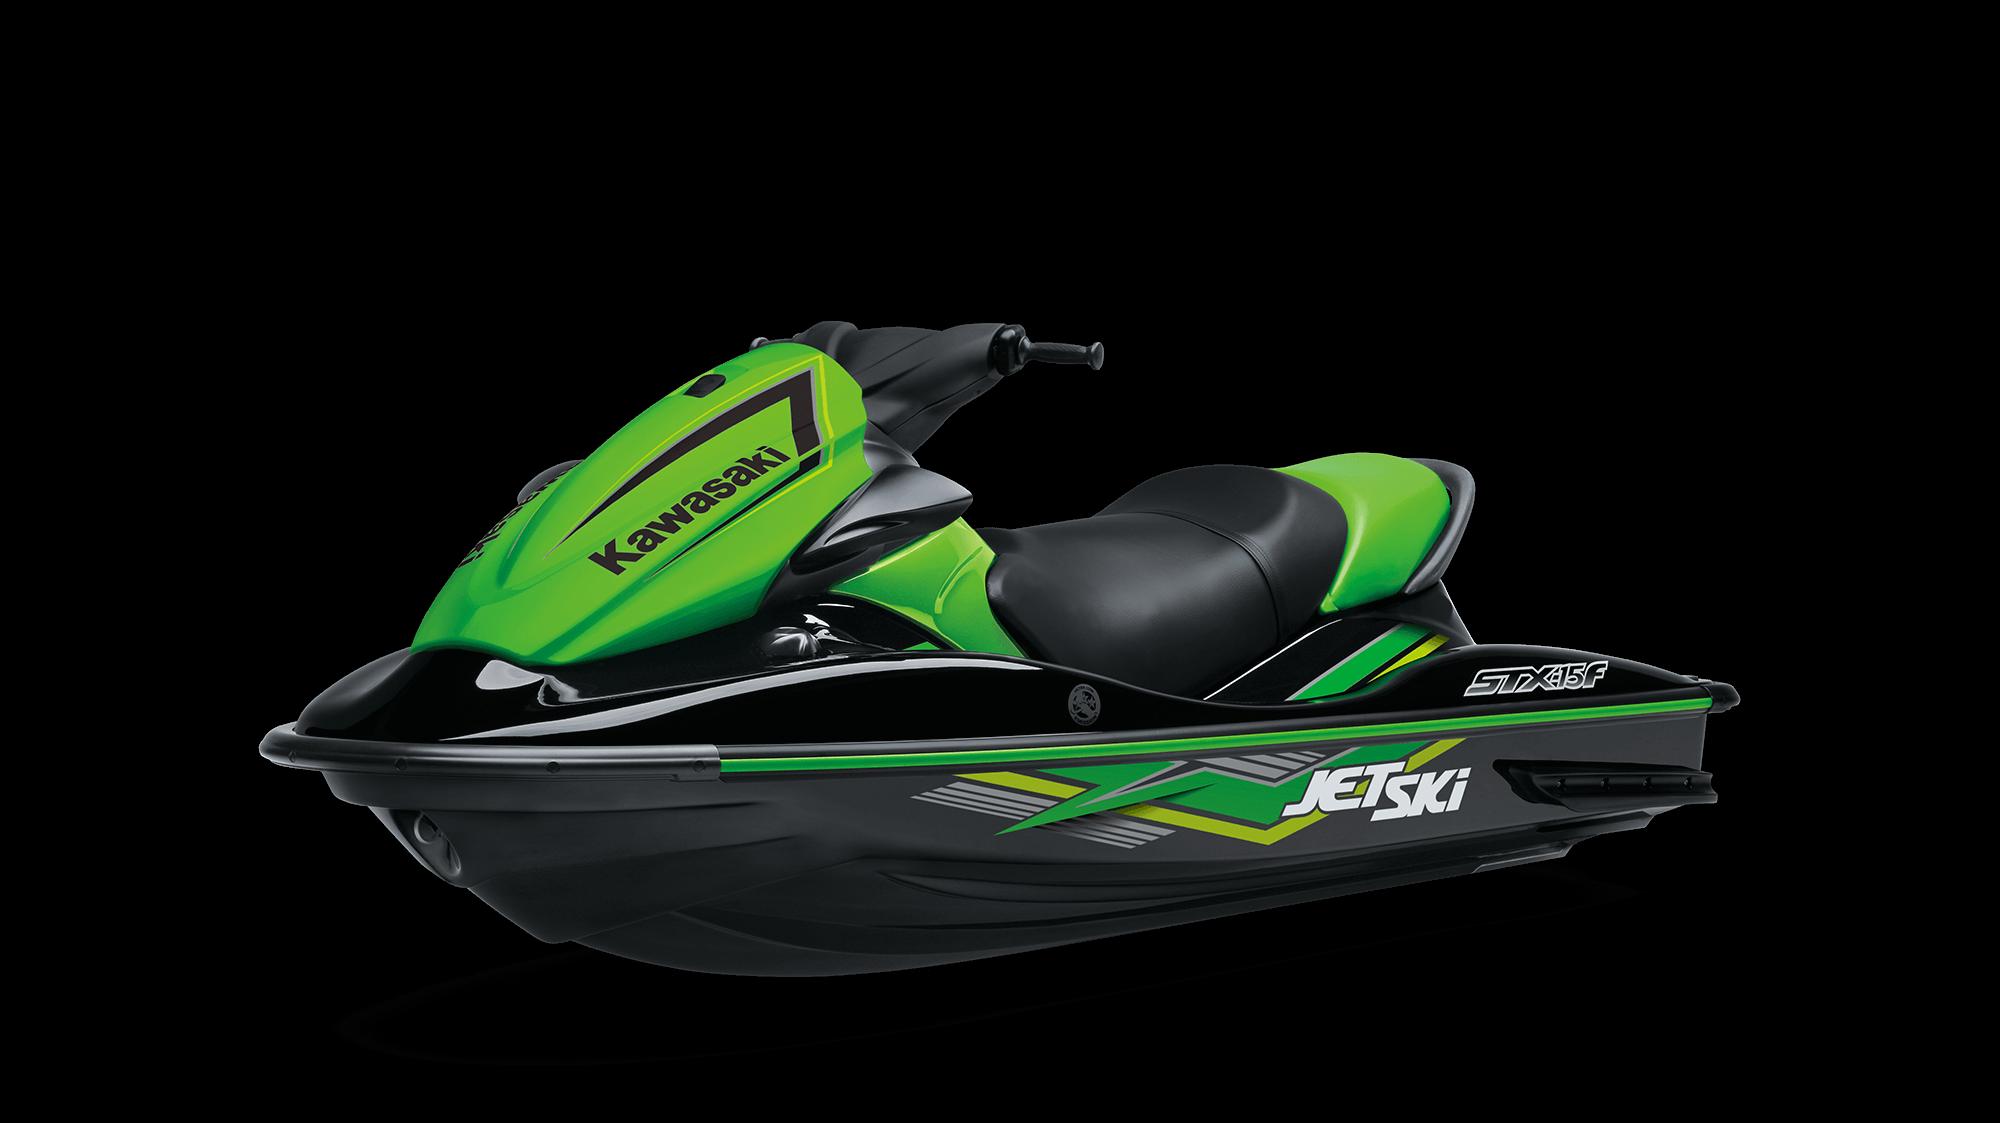 Kawasaki Waverunner Engine Diagram List Of Schematic Circuit 750 Ss Wiring 2019 Jet Ski Stx 15f Watercraft By Rh Com